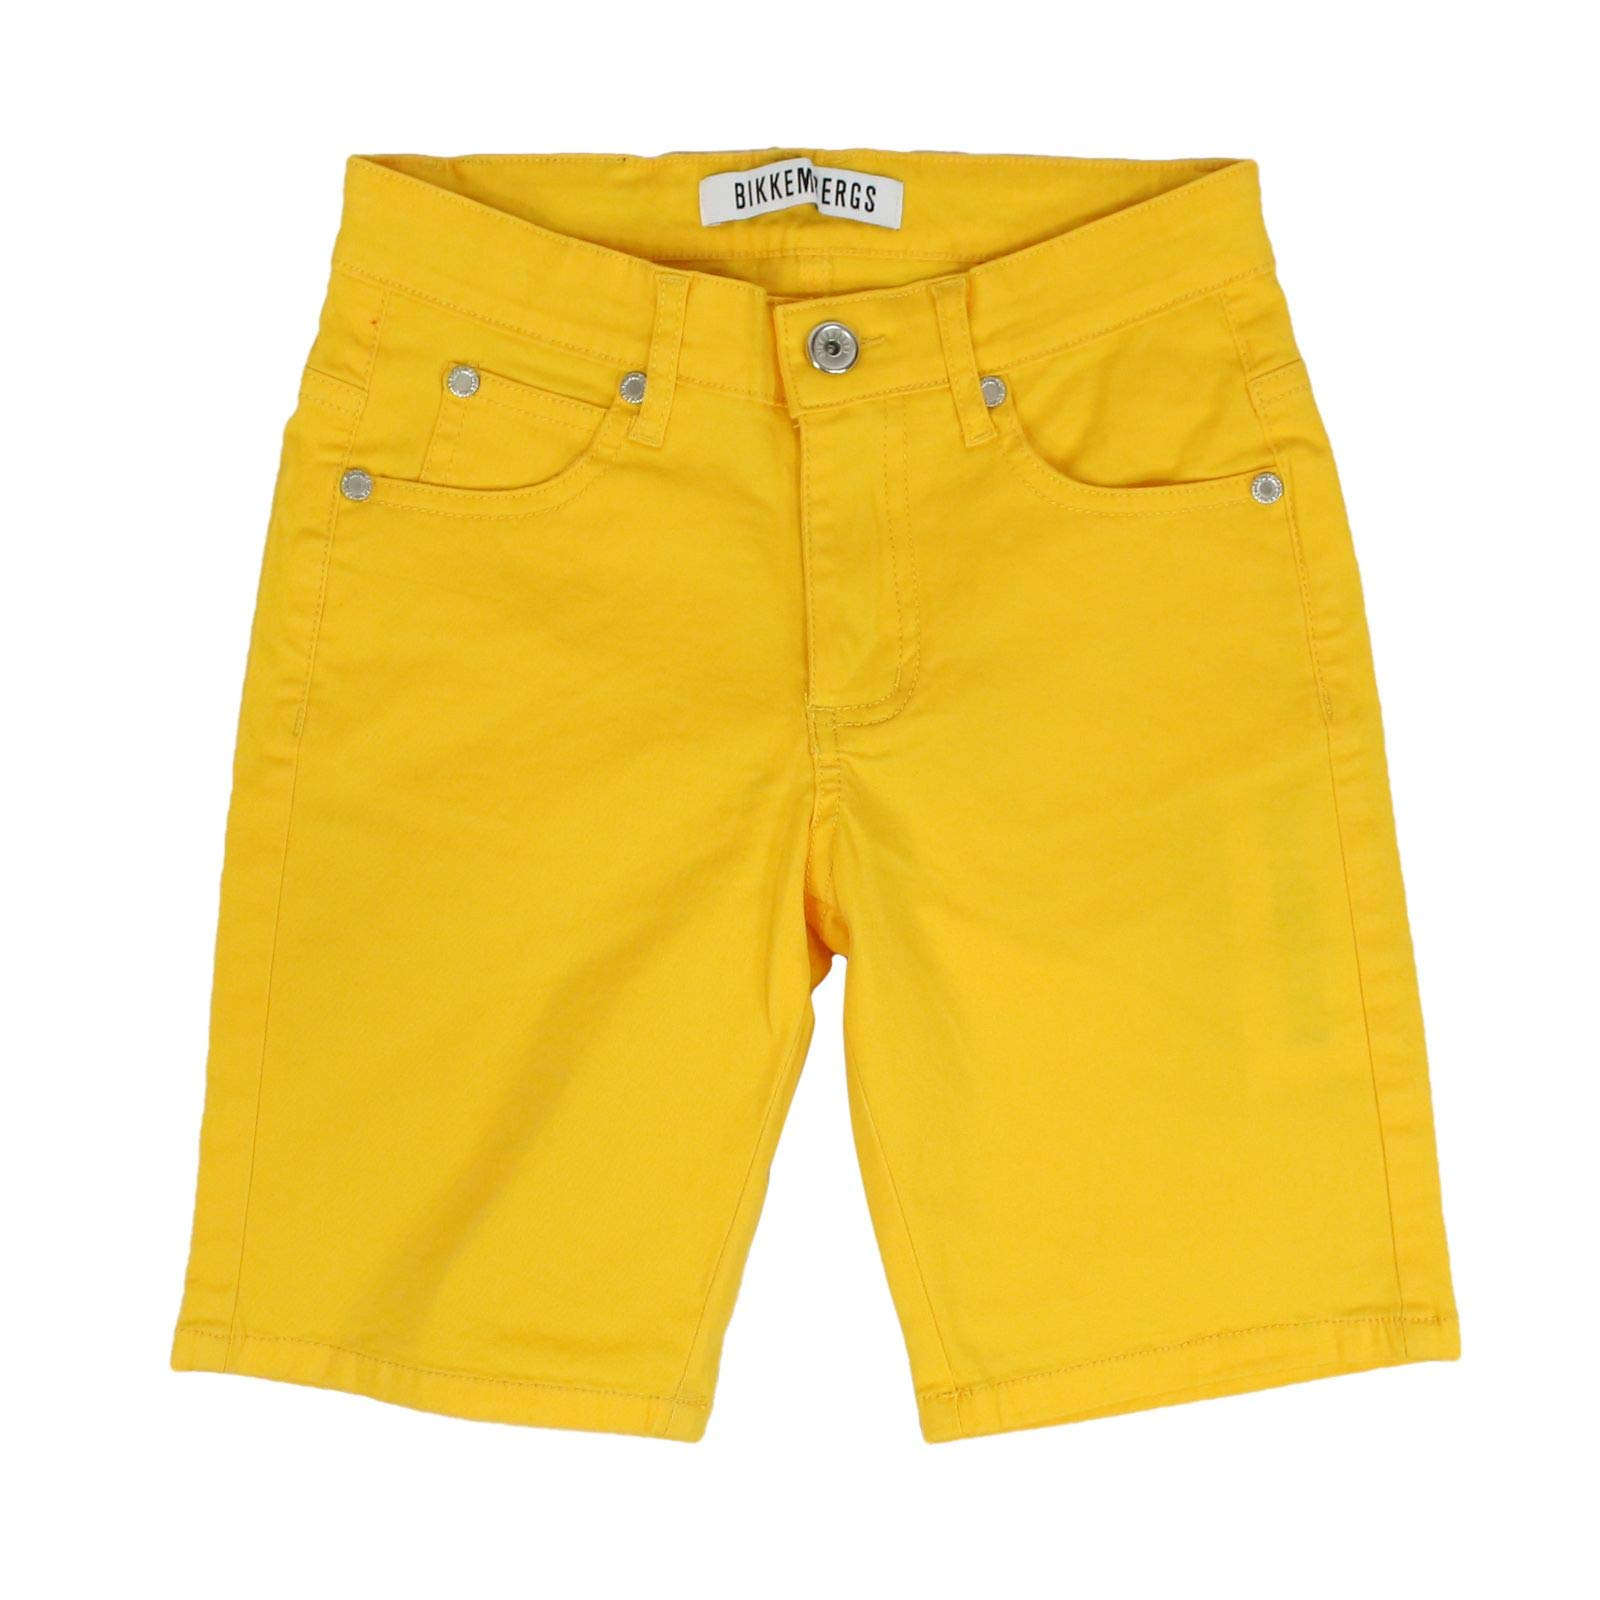 Bikkembergs Boys 2375771 Yellow Cotton Shorts